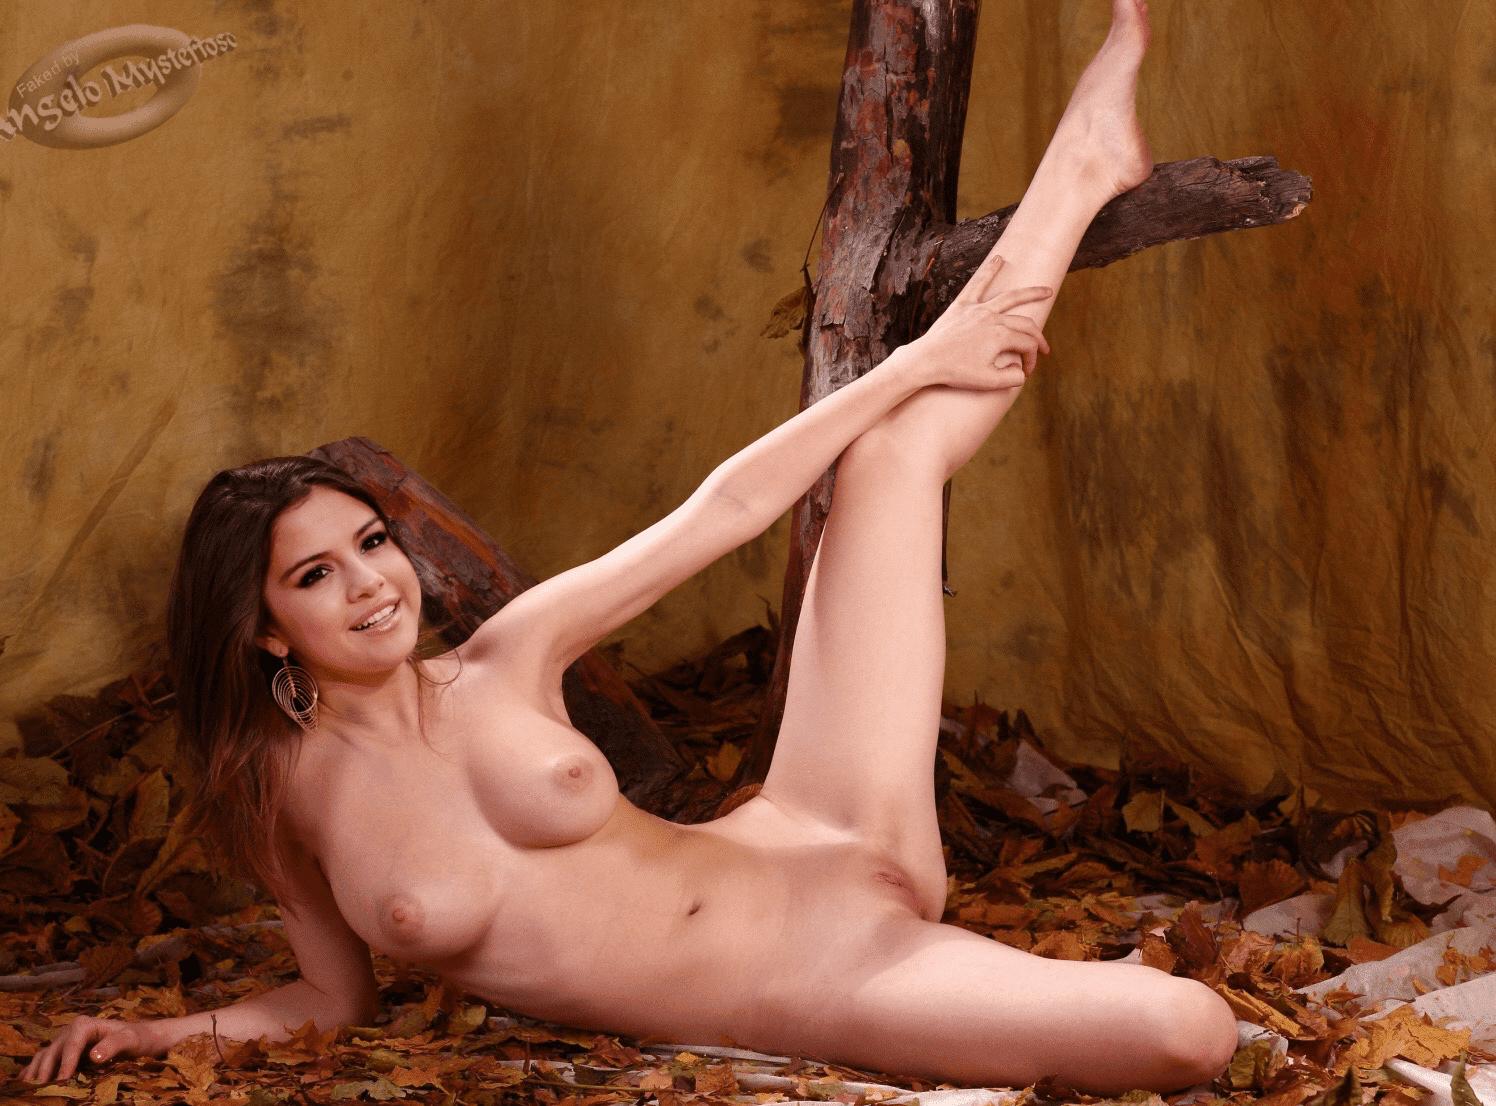 Andrea Rincon Deanuda selena spice nude photos - megapornx